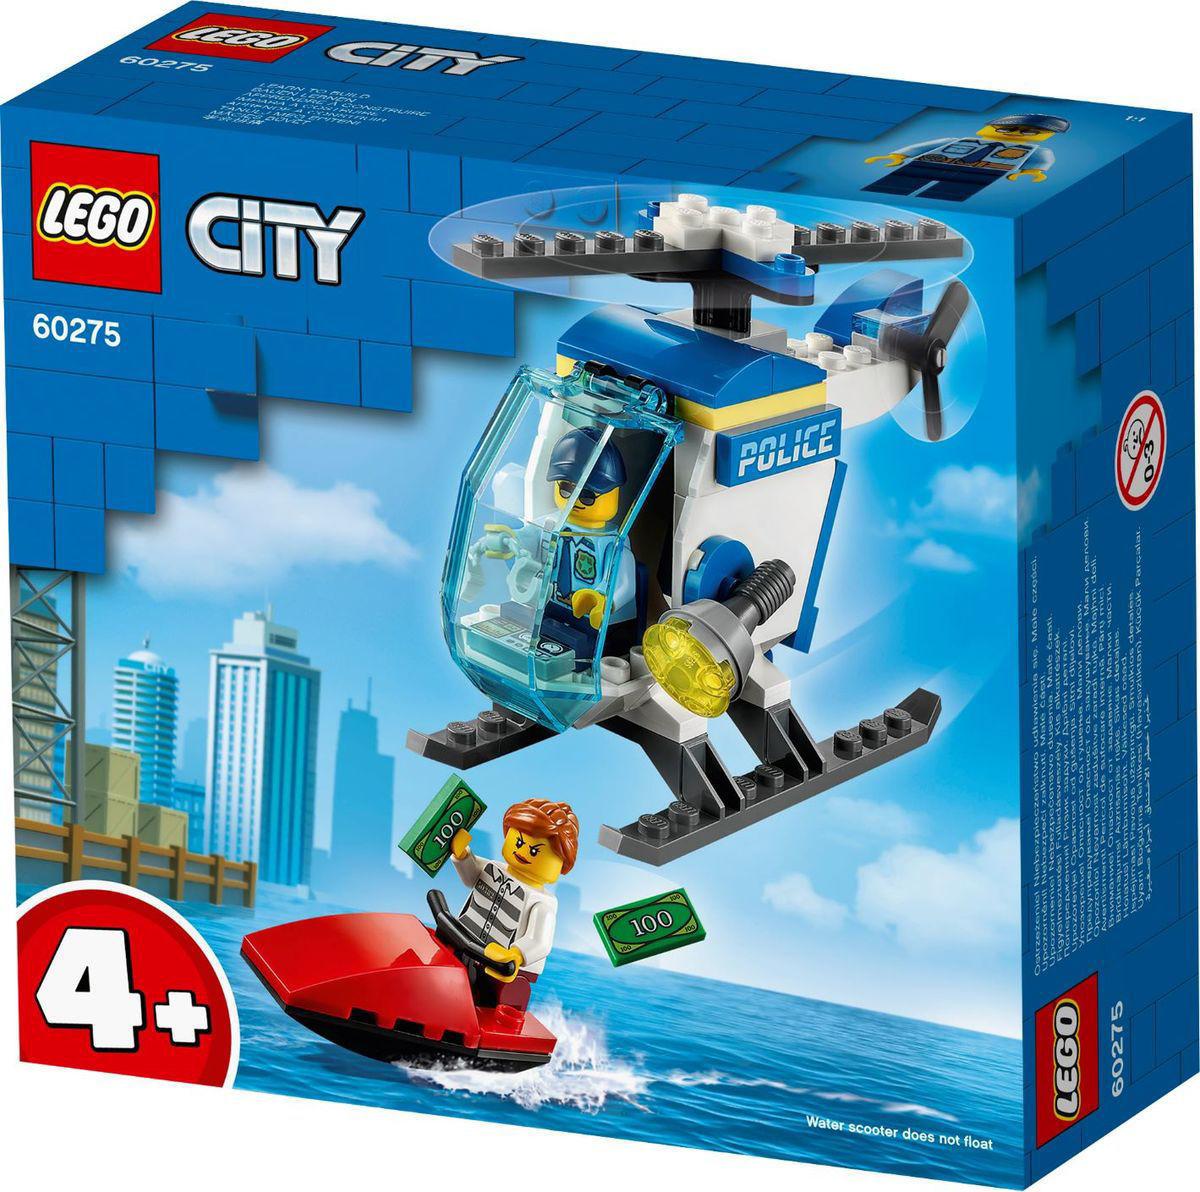 Imagen de LEGO City Police Helicopter 60275